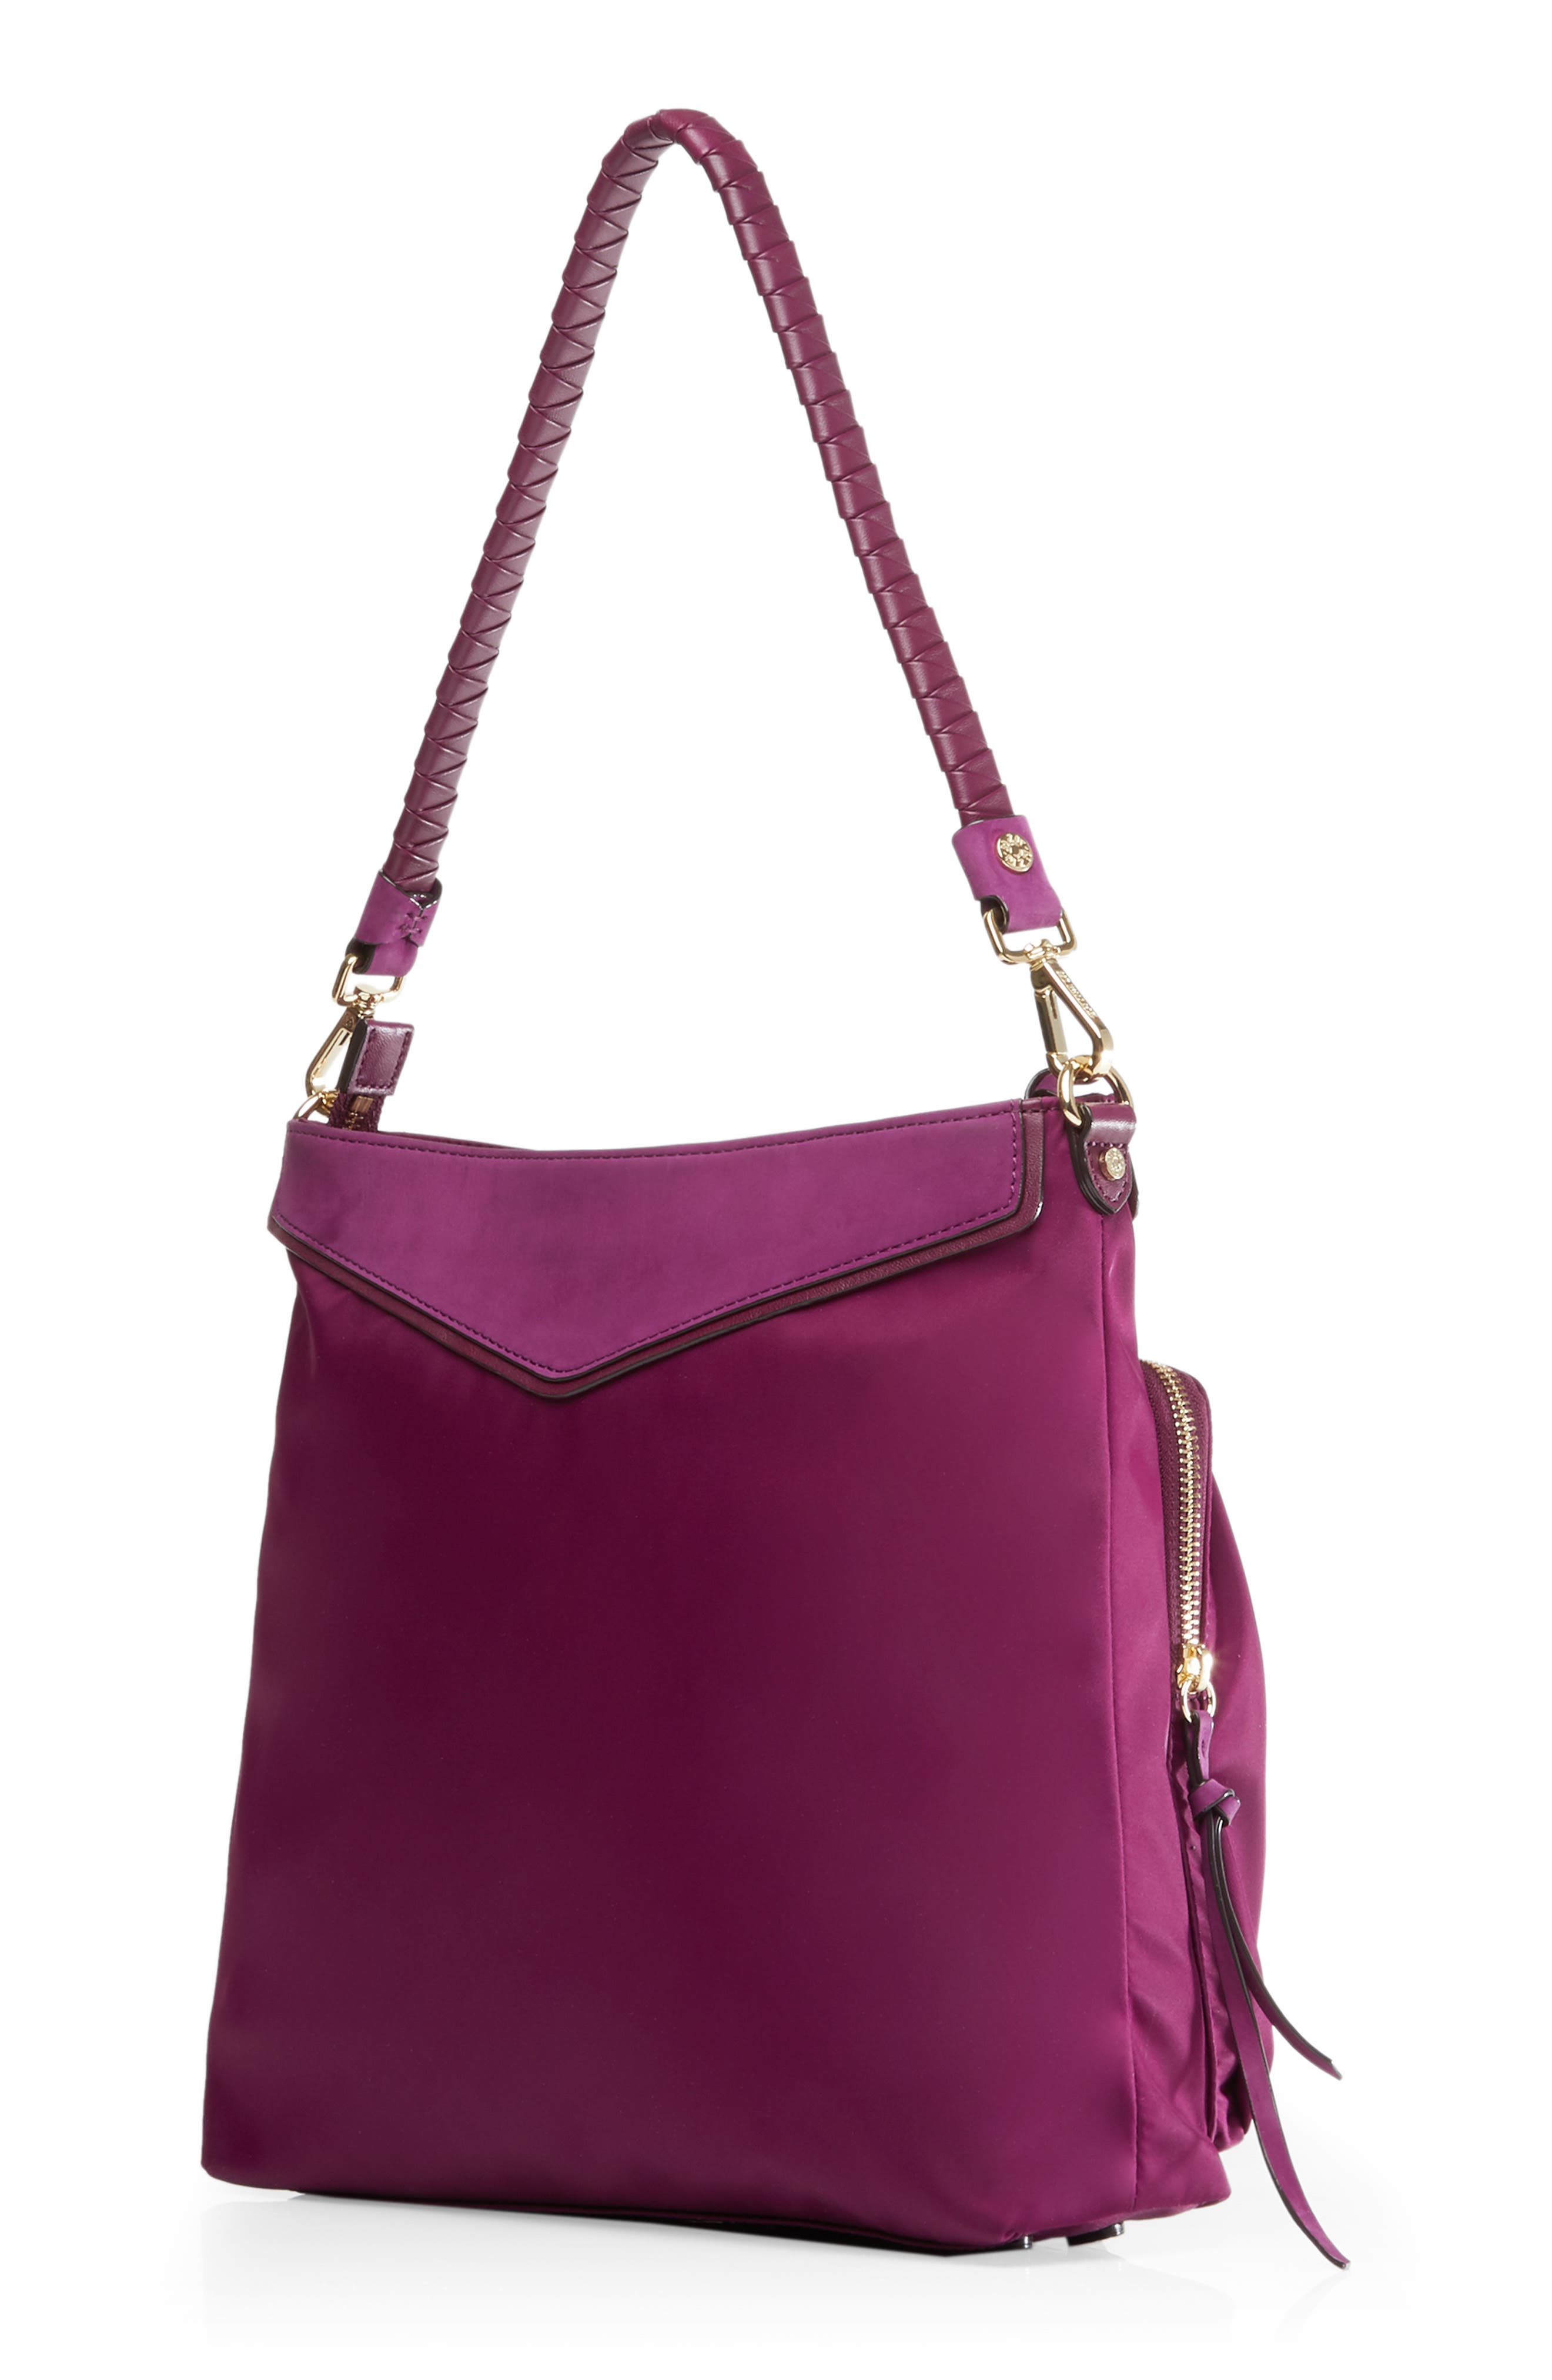 04923e04a2 Purple Handbags   Wallets for Women